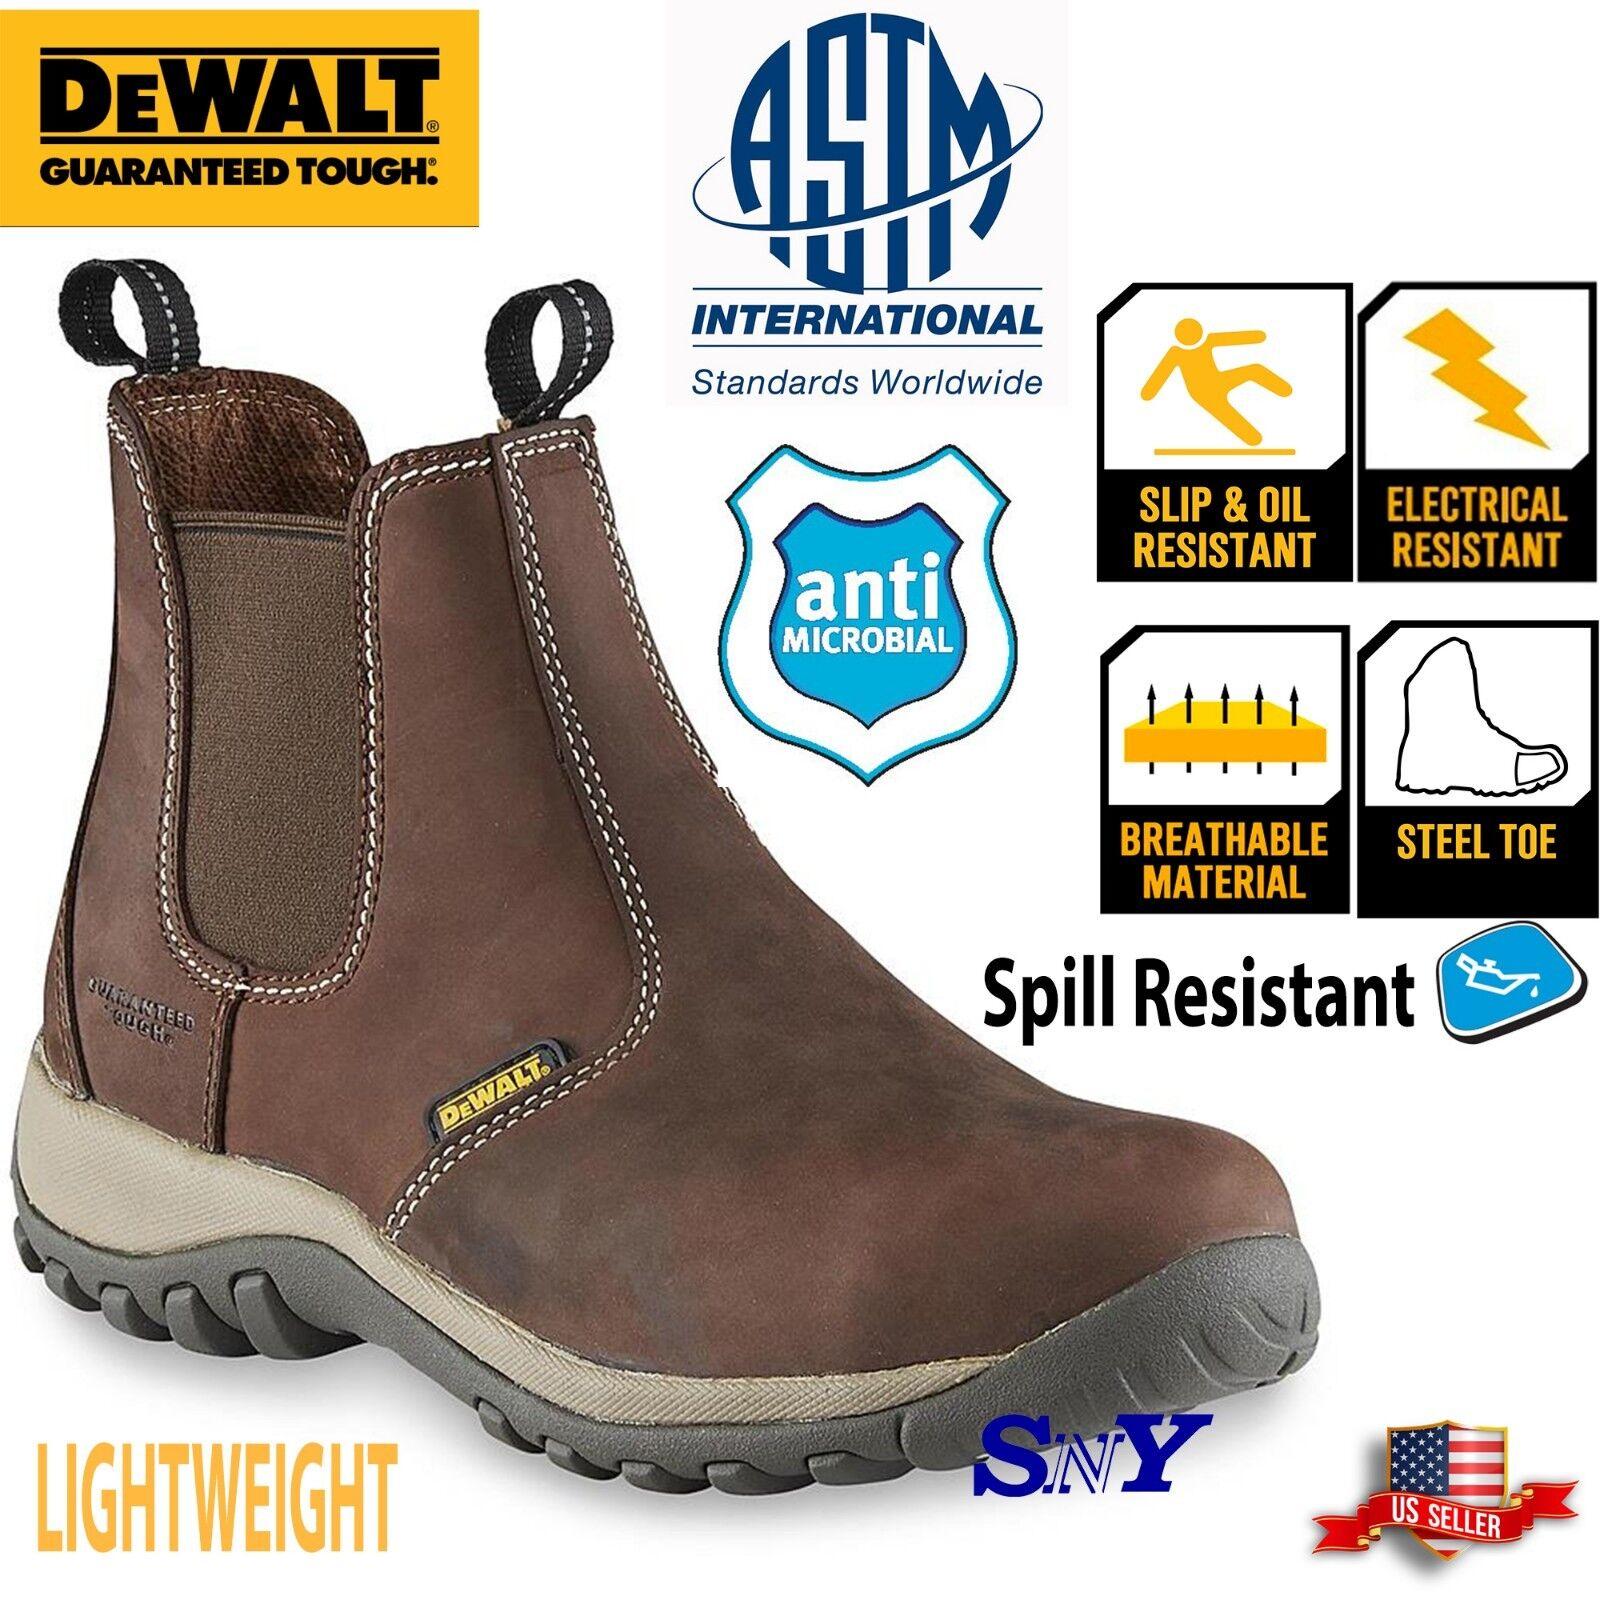 DeWALT Steel Toe Chelsea Pull-on Work Boots Slip resistant Boot ASTM EH Rated